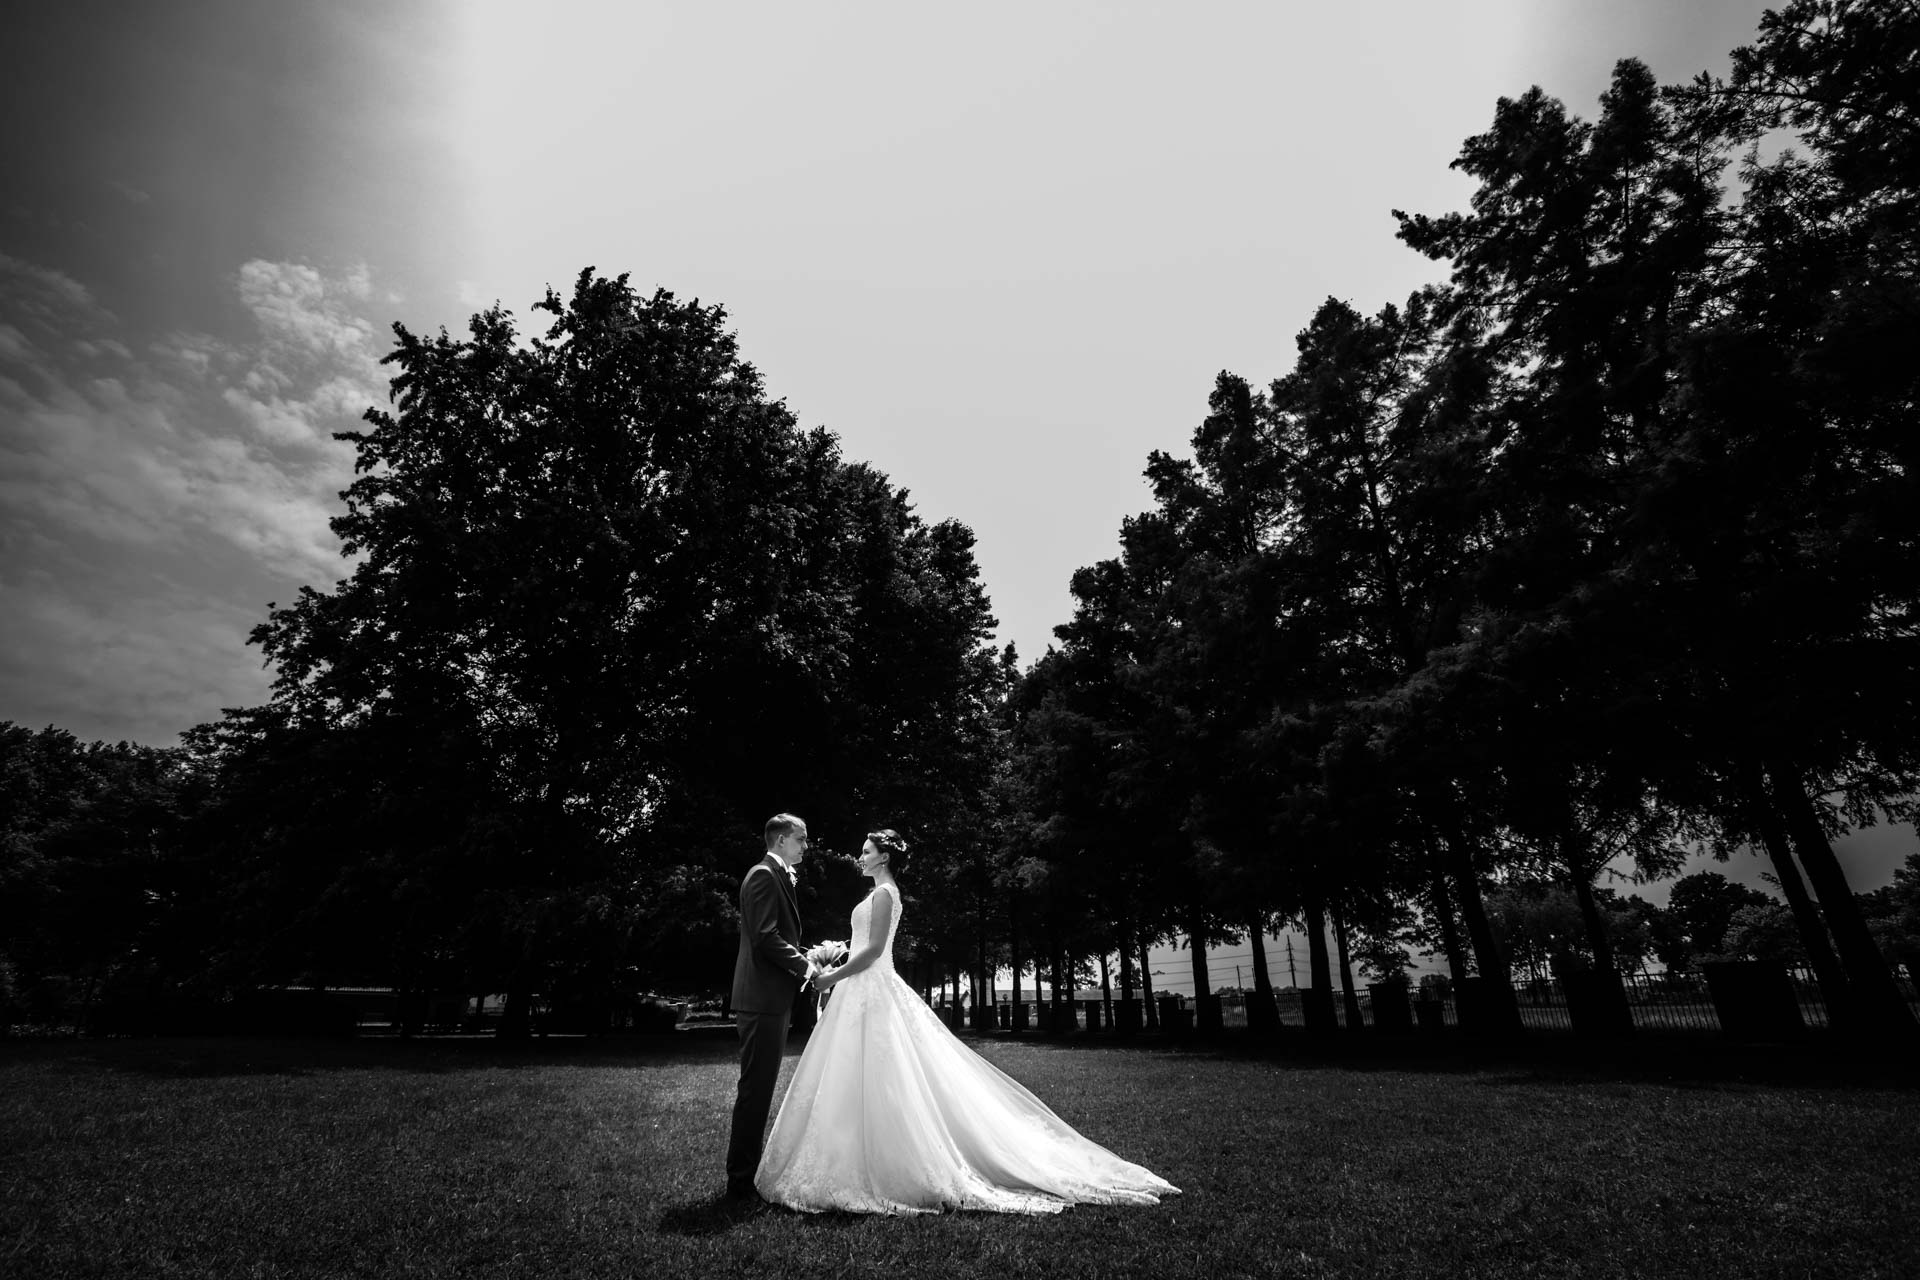 sposi sguardi esterna bianco nero